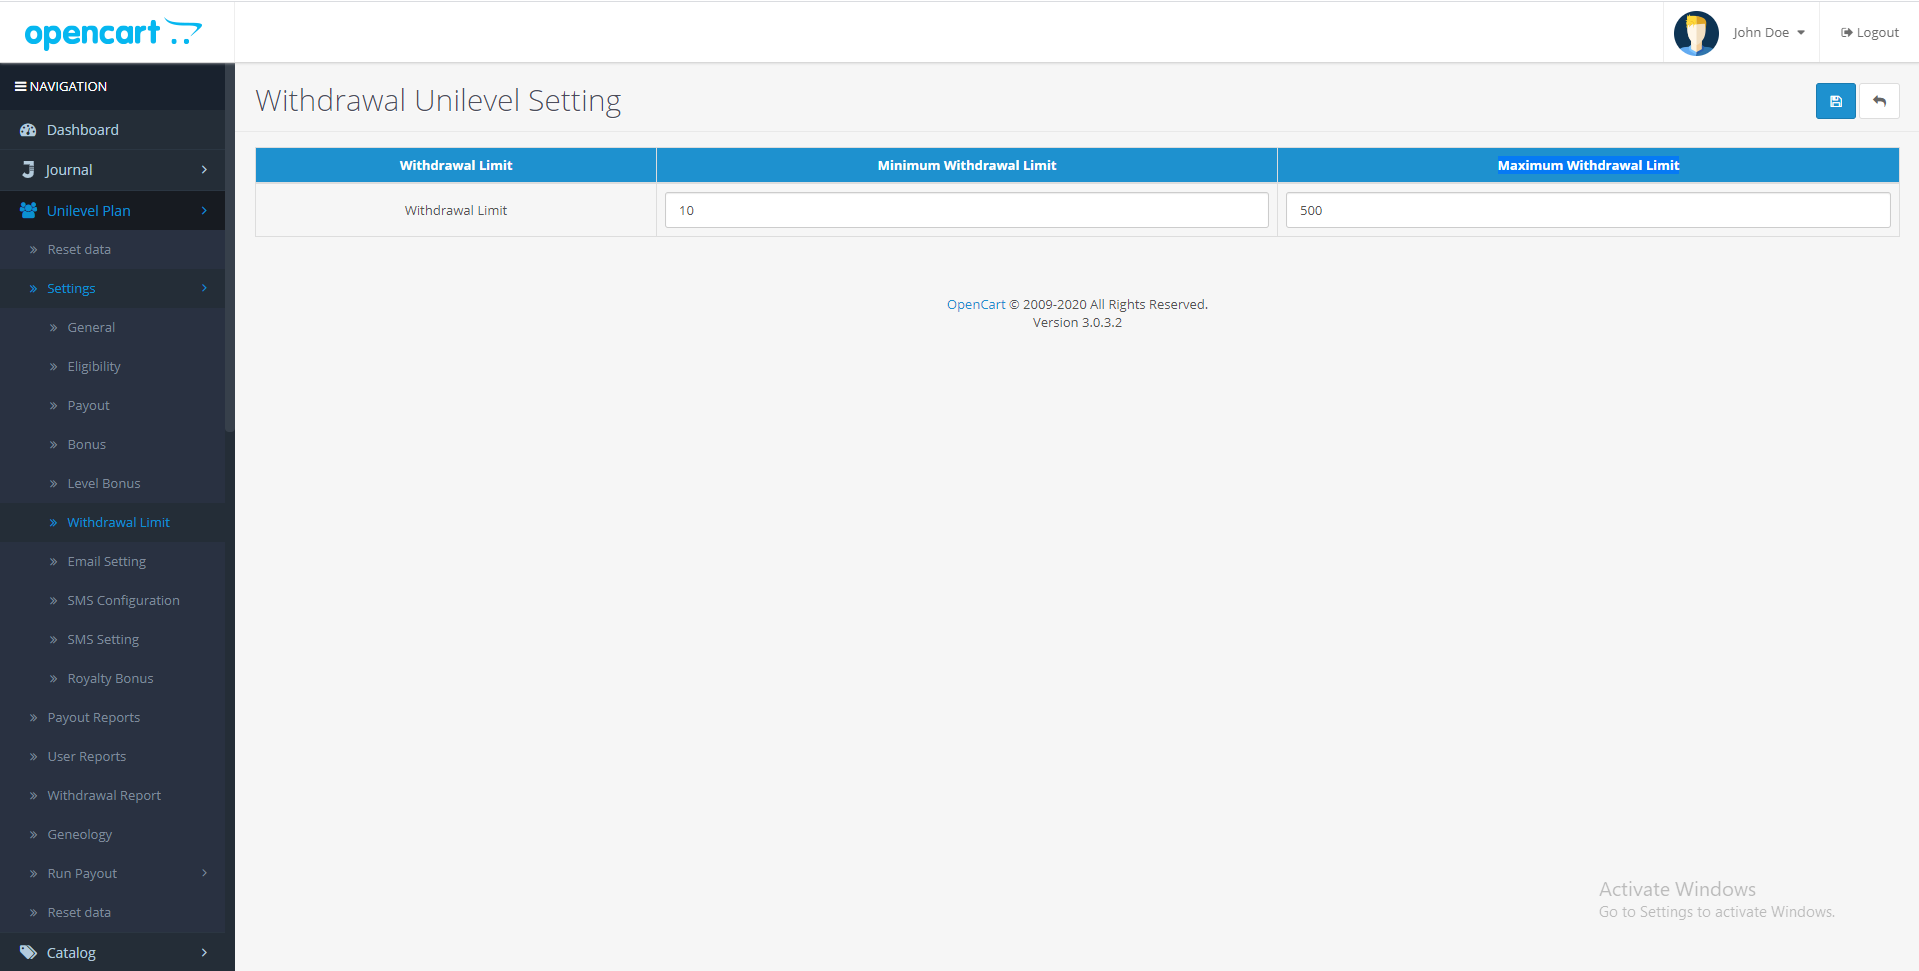 |'Opencart'| |'letscms'| |'opencart unilevel mlm plan'| |'withdrawal'| |'Dashboard'| |'unilevel mlm plan'| |'mlm'| |'mlm Plan'|  |'setting'| |'new users'| |'unilevel'| |'unilevel mlm extension'| |'costomer list'| |'new users'| |'Installer'| |'mlmtrees.com'| |'mlm plan'| |'extension'| |'Opencart mlm plan'|